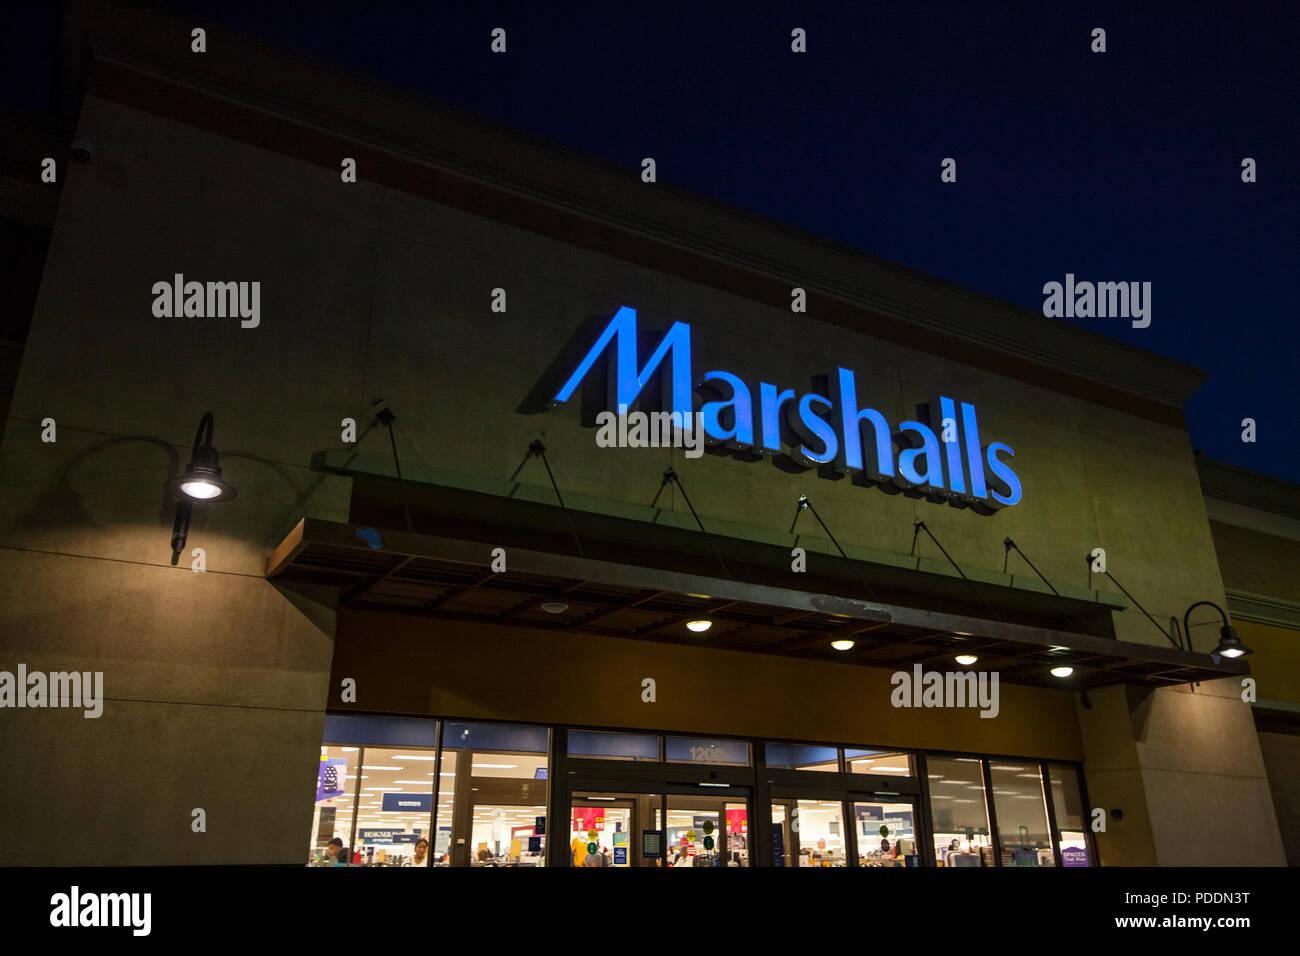 Marshalls Brooklyn Ny >> Marshalls Brooklyn Ny Marshall S 2019 10 08